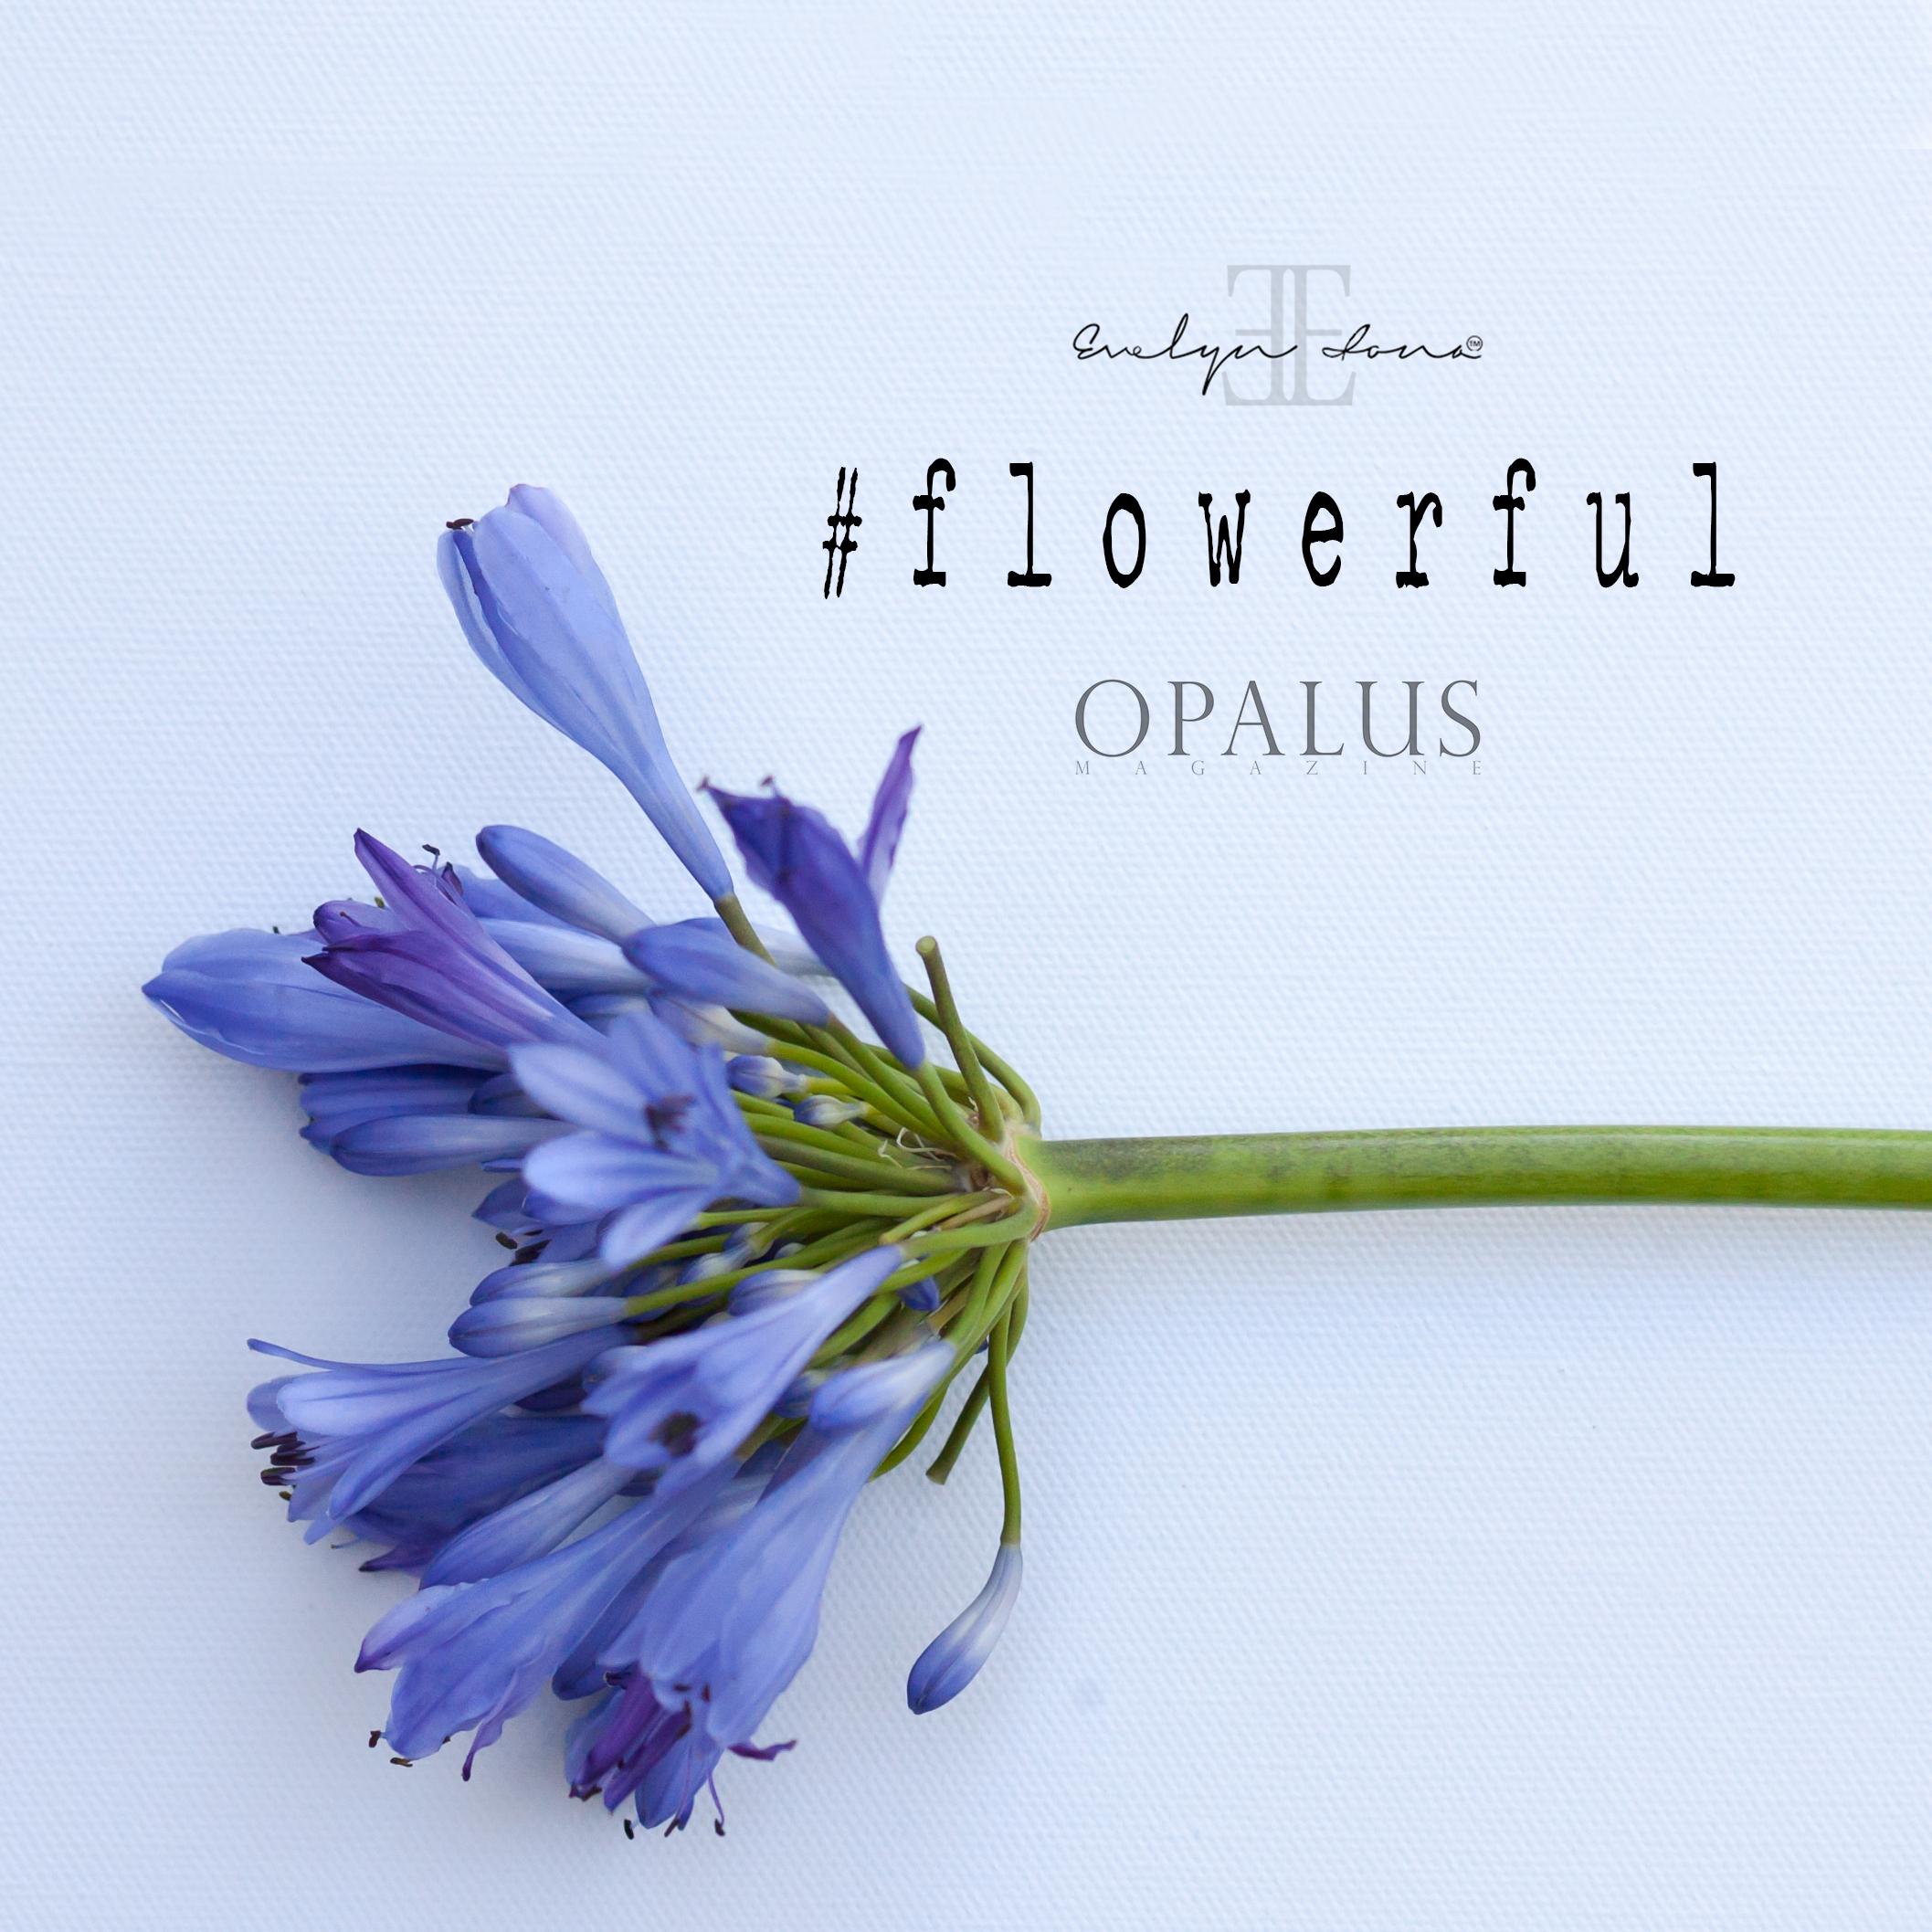 Flowerful_day9.jpg